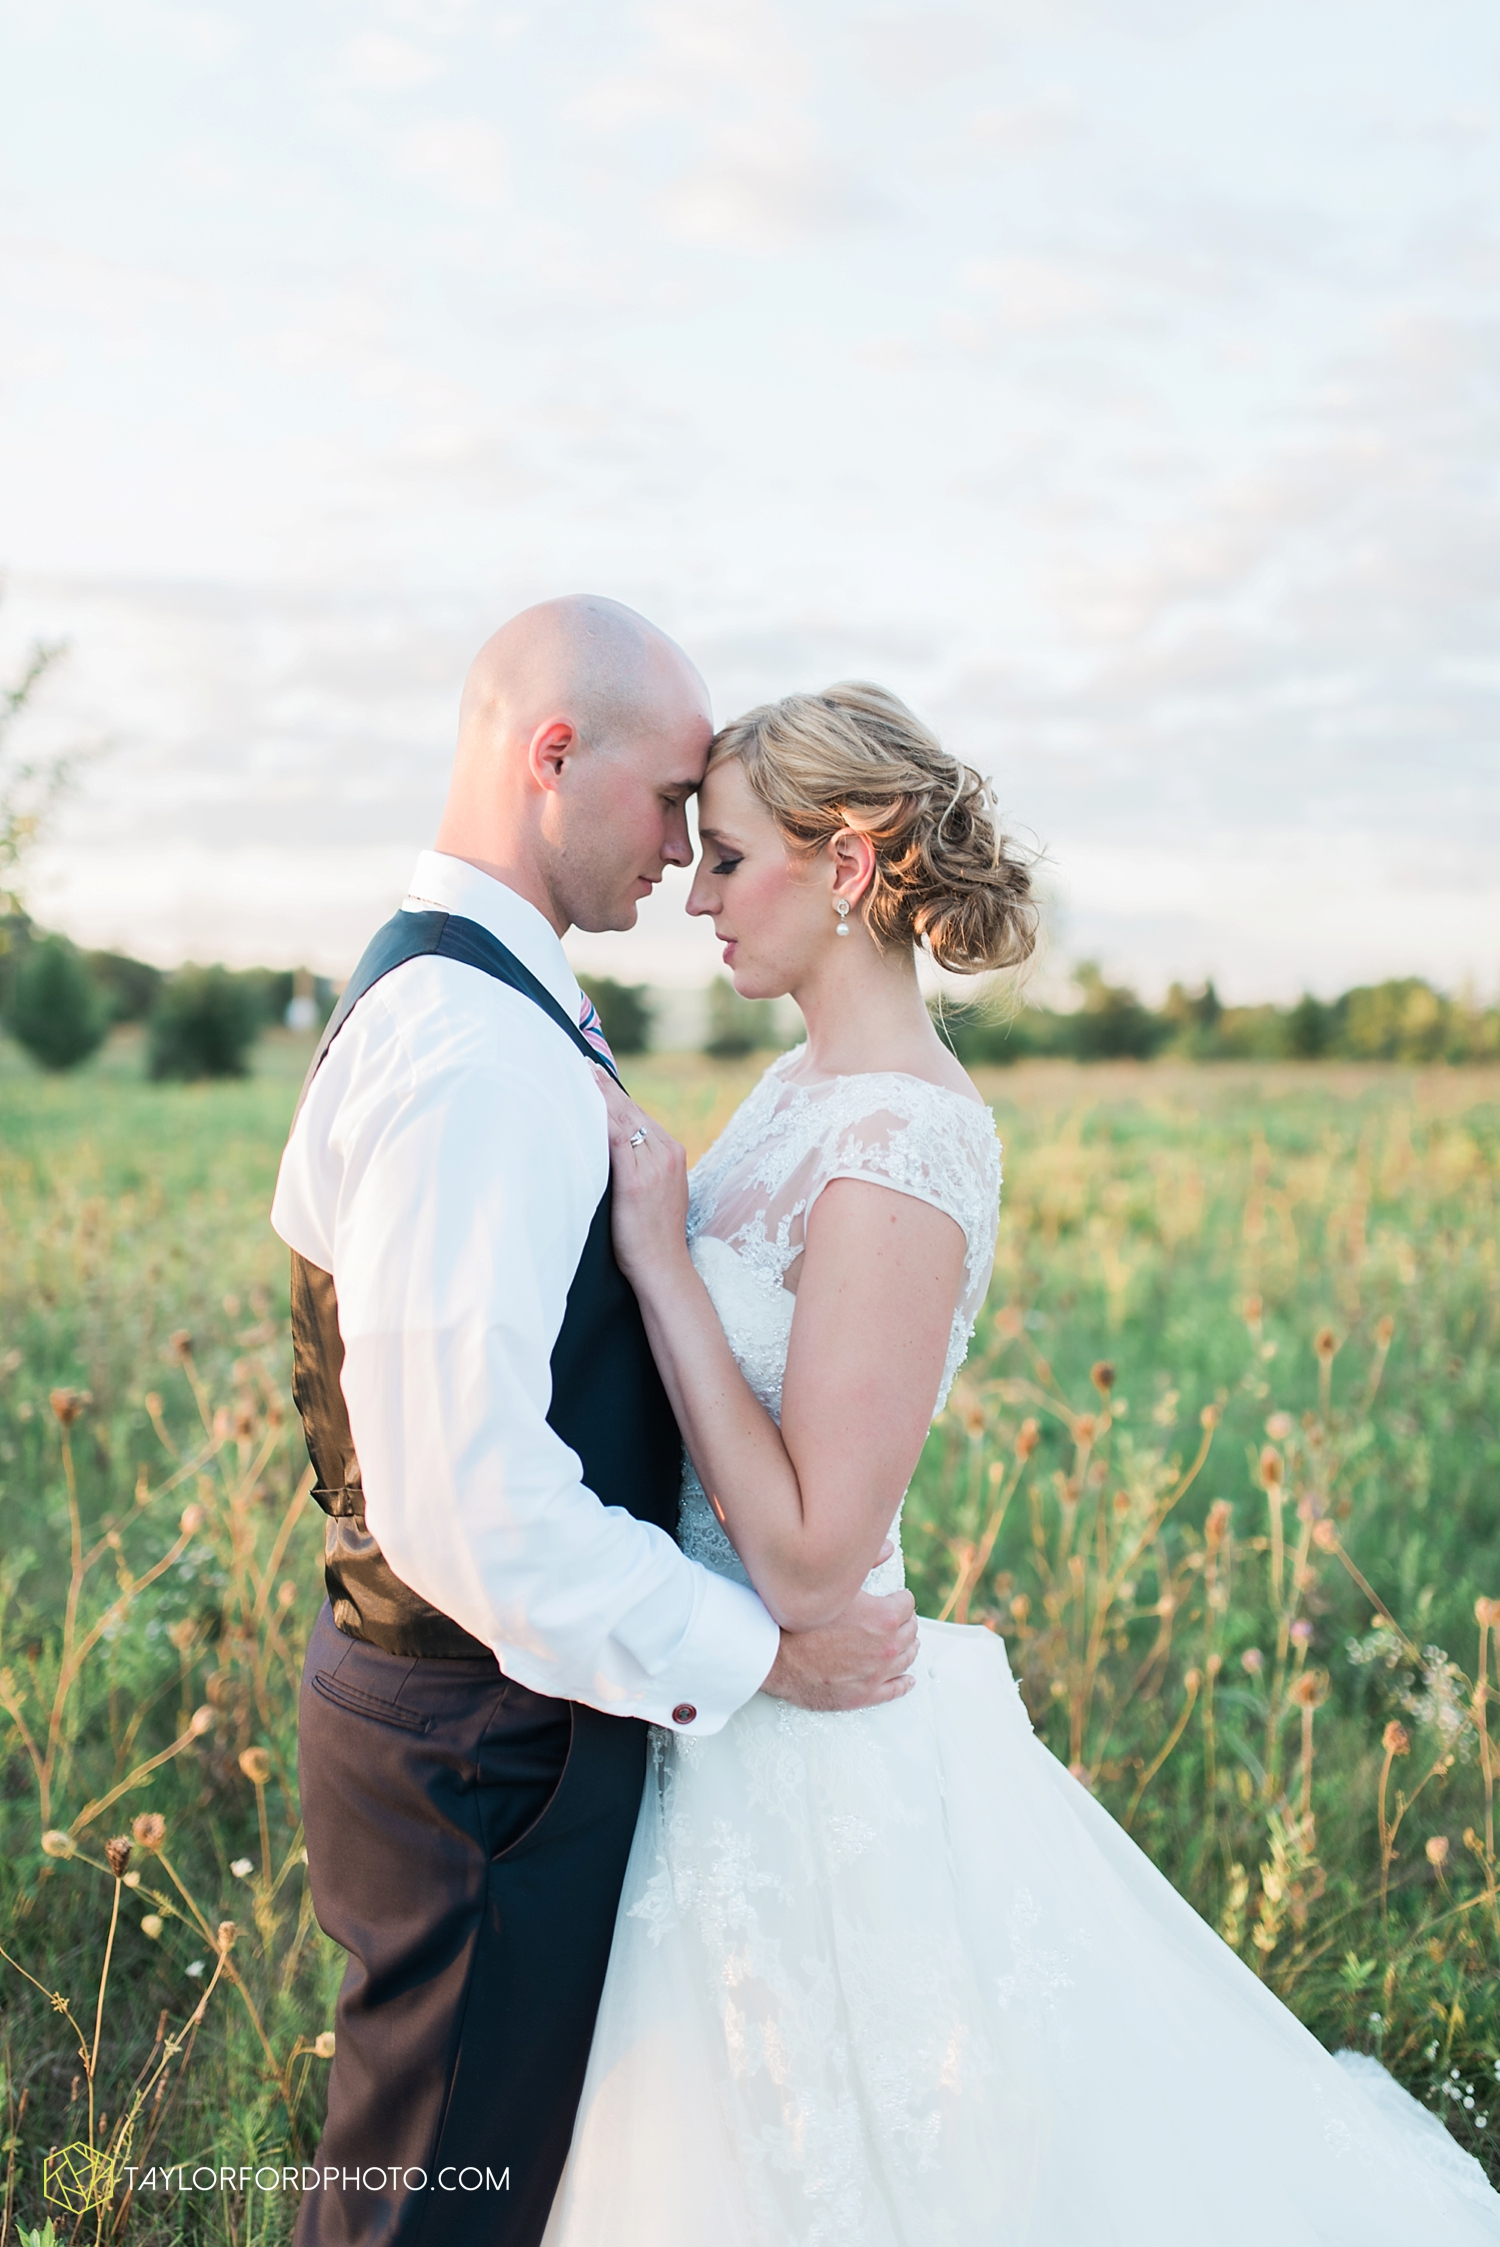 van_wert_ohio_fort_wayne_indiana__photographer_taylor_ford_nashville_tennessee_family_wedding_senior_cerutis_catering_2544.jpg